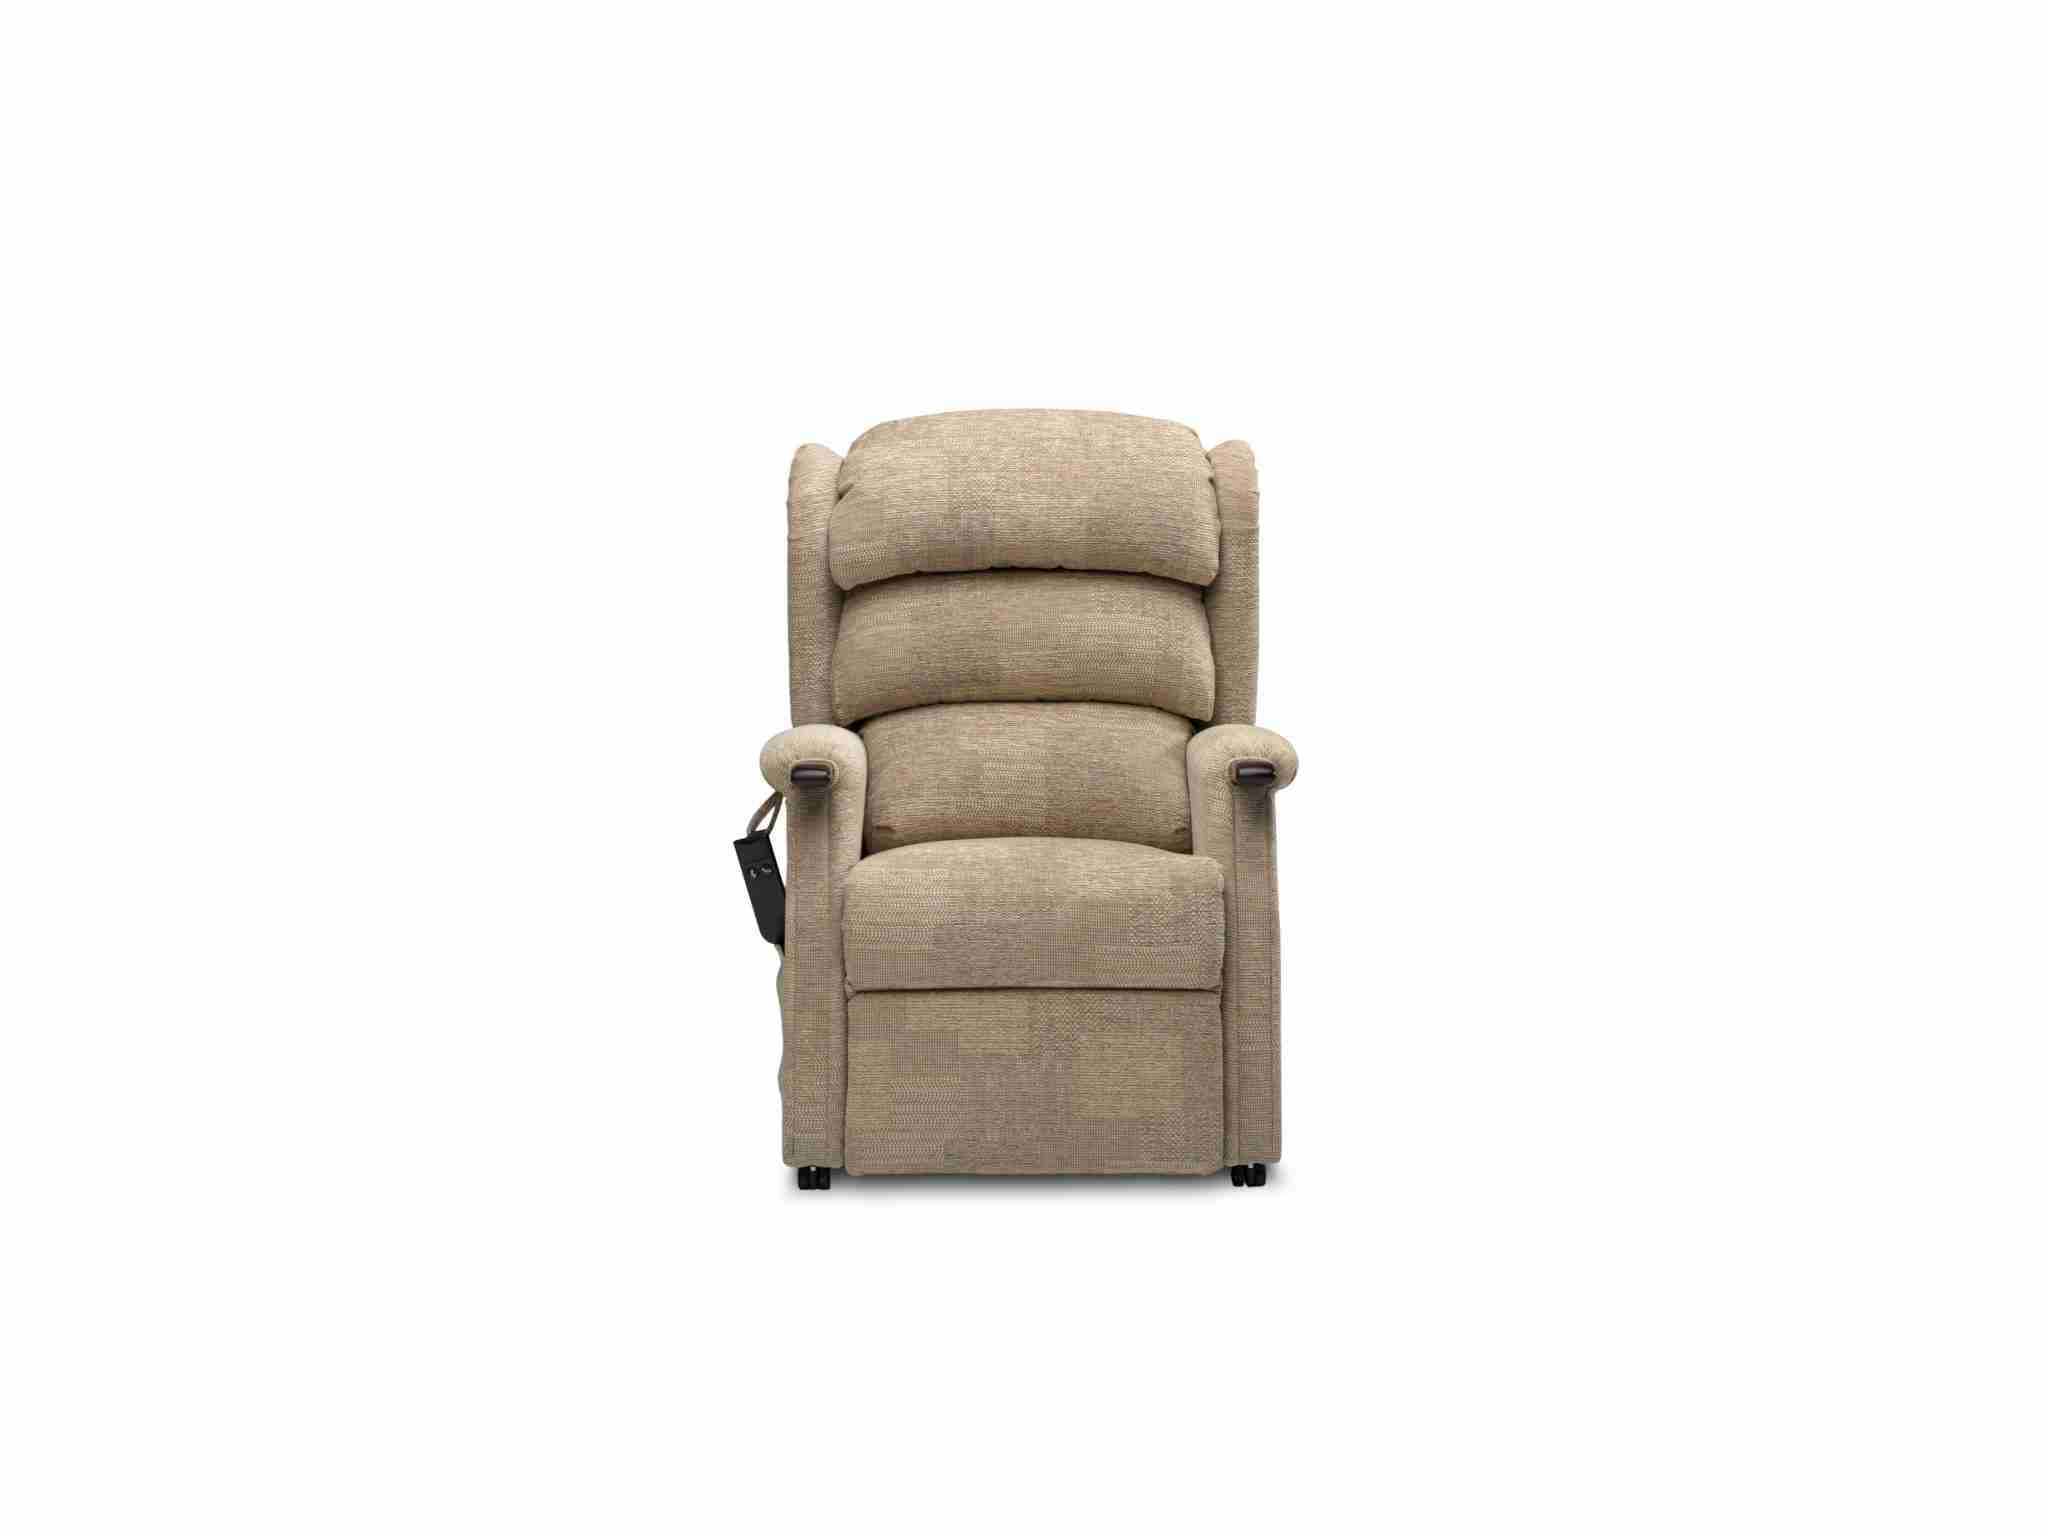 Rimini Chair WA Repose001